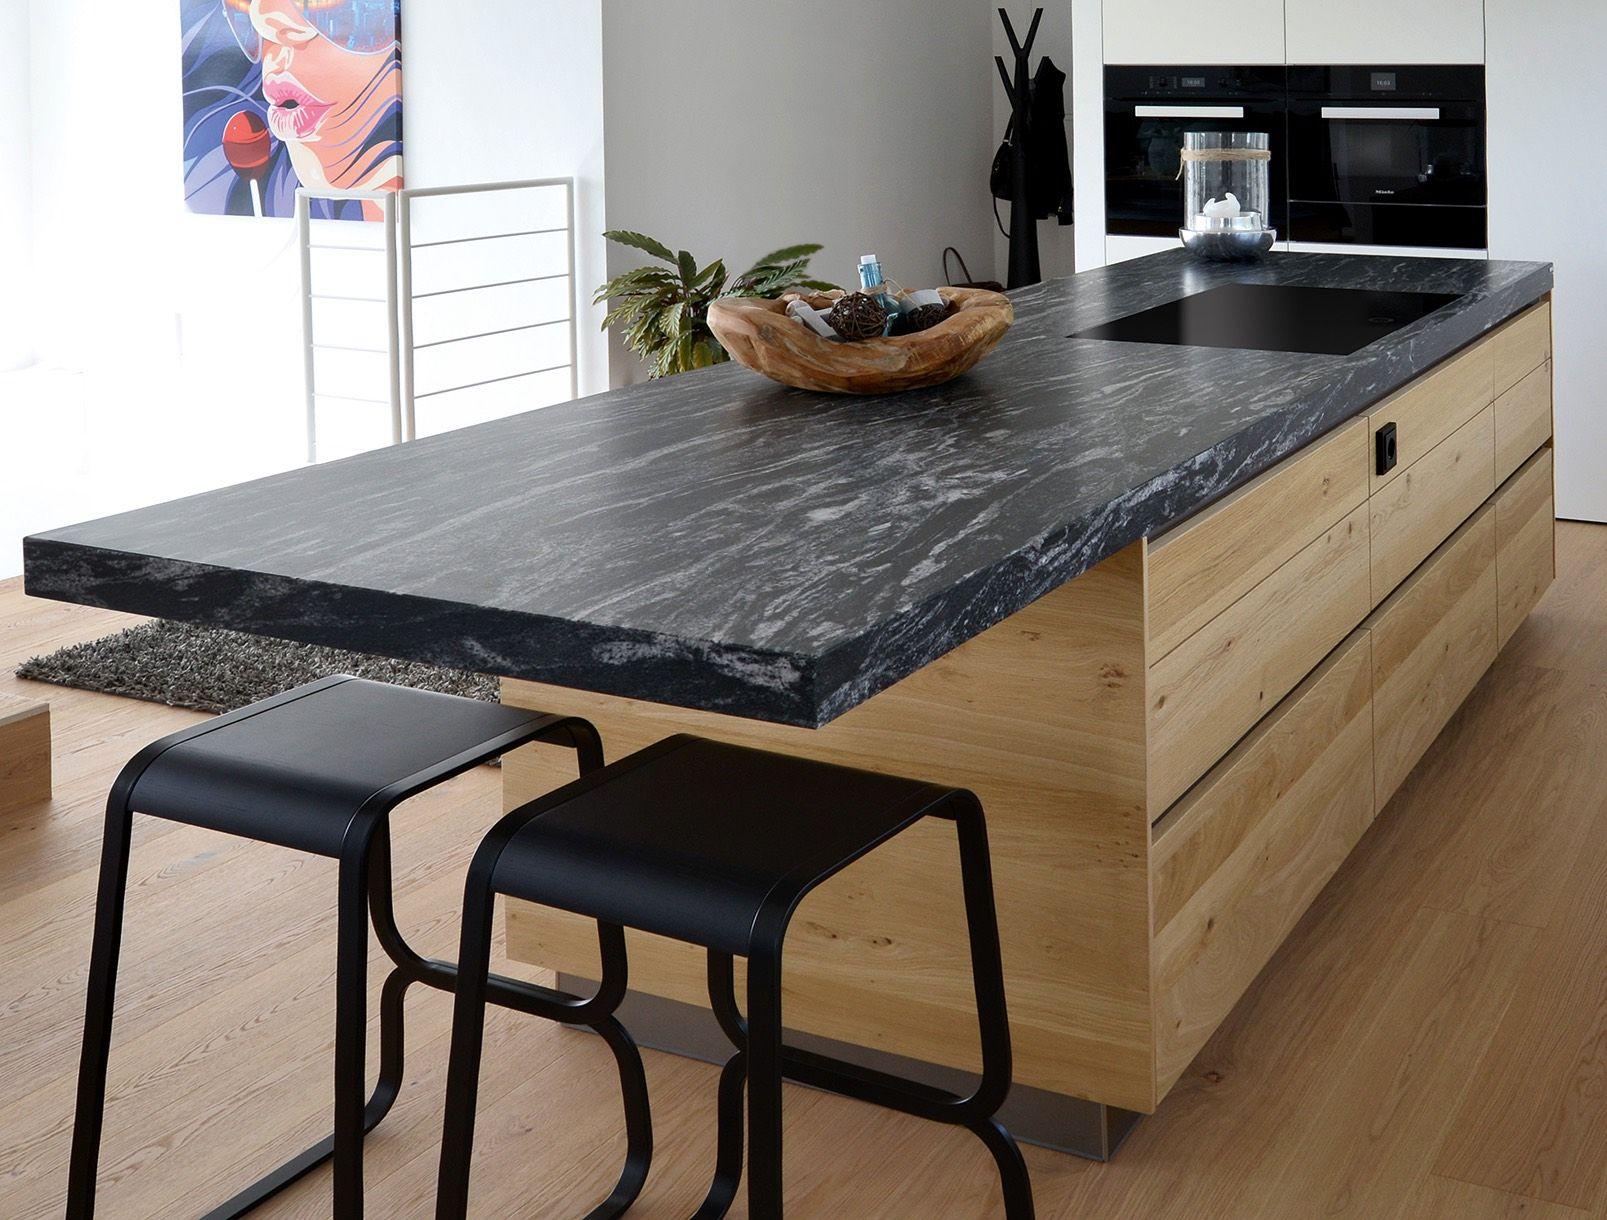 Küchendesign marmor black skorpionuc u tiefgründig  küche  pinterest